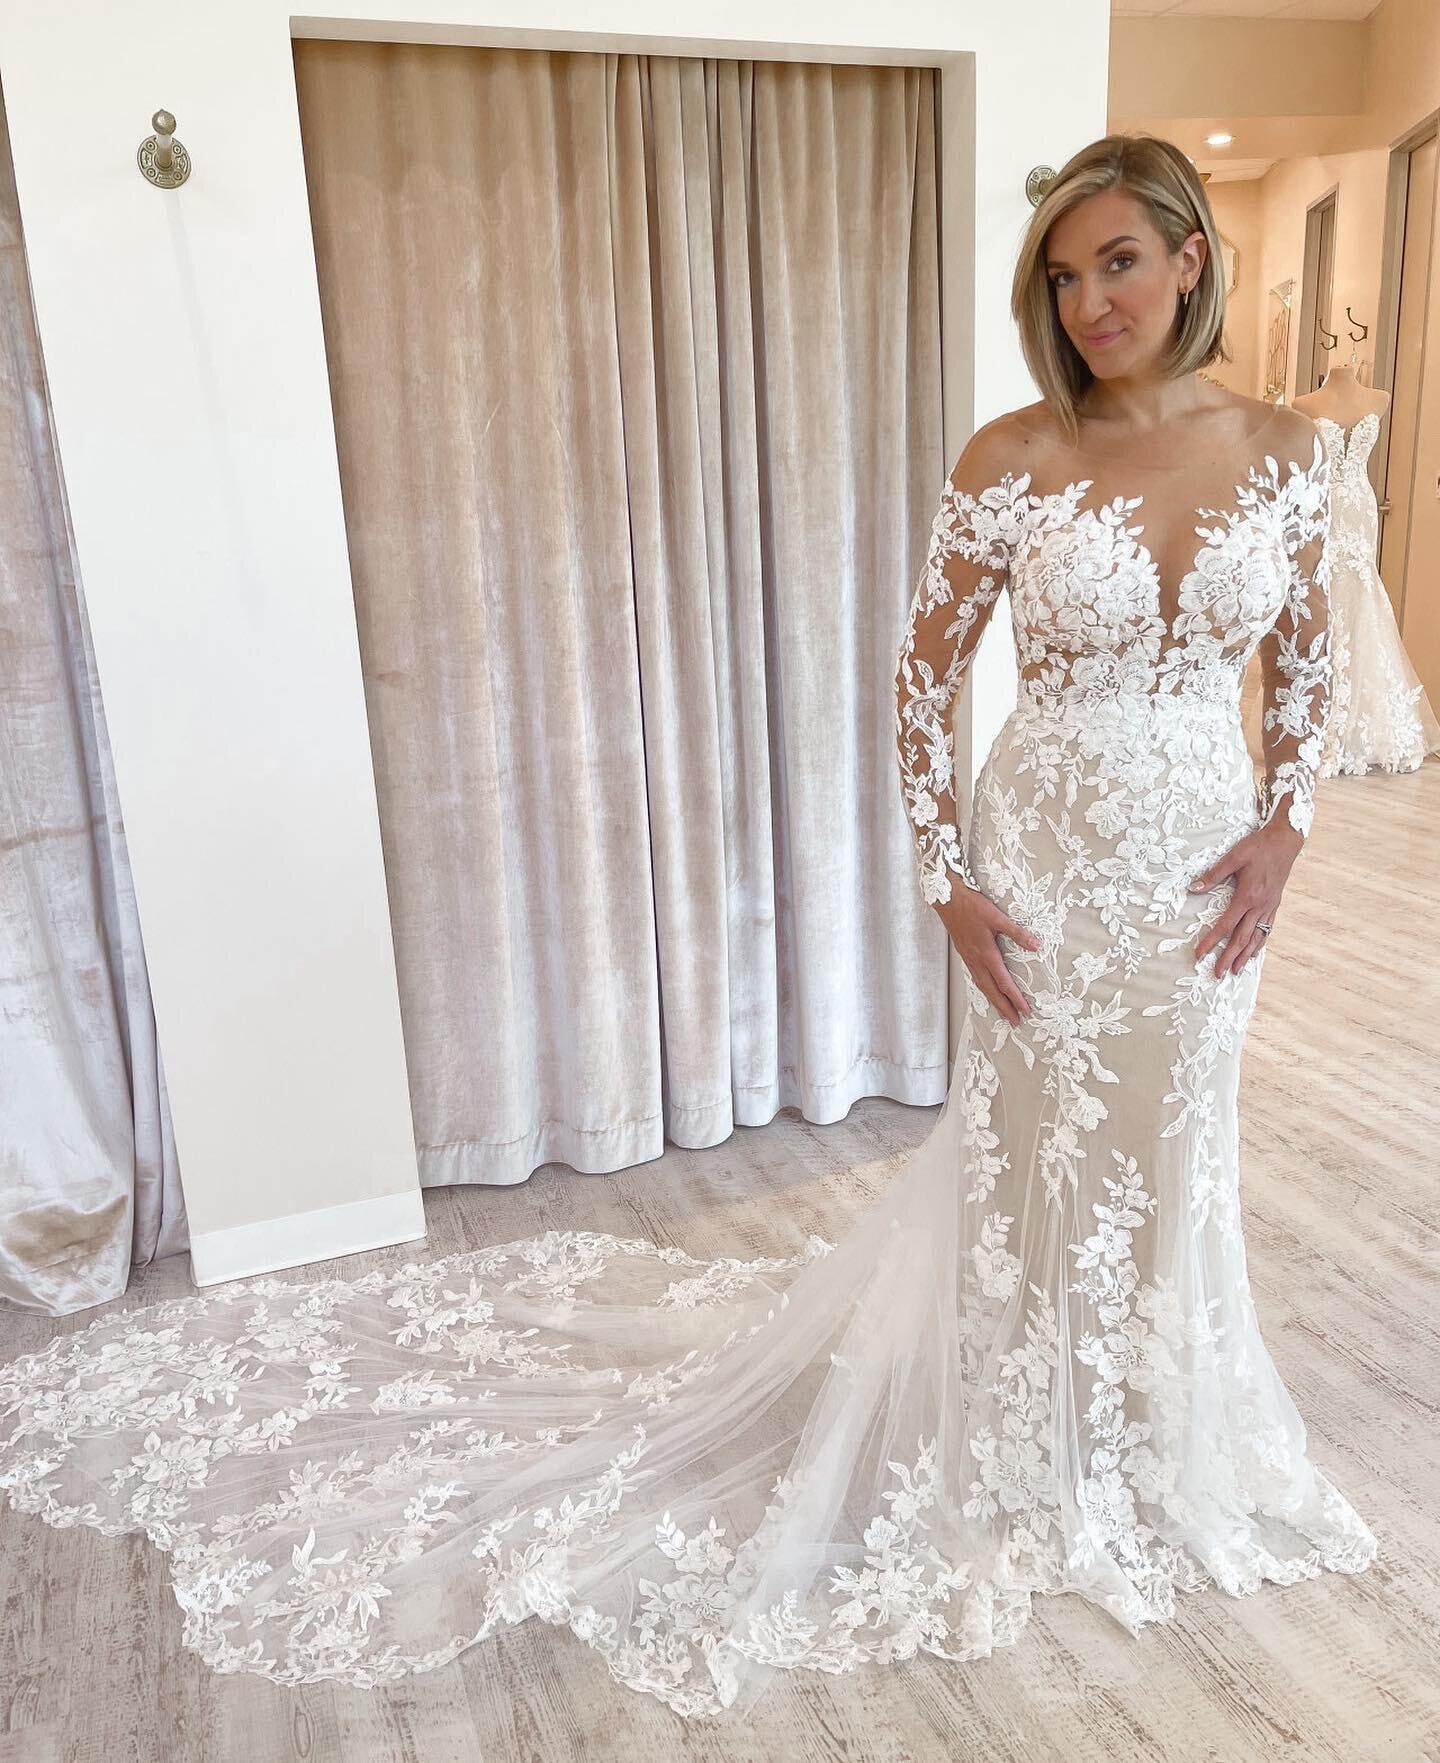 Brickhouse Bridal   Wedding Dresses in Houston, Tx   Bridal Shop